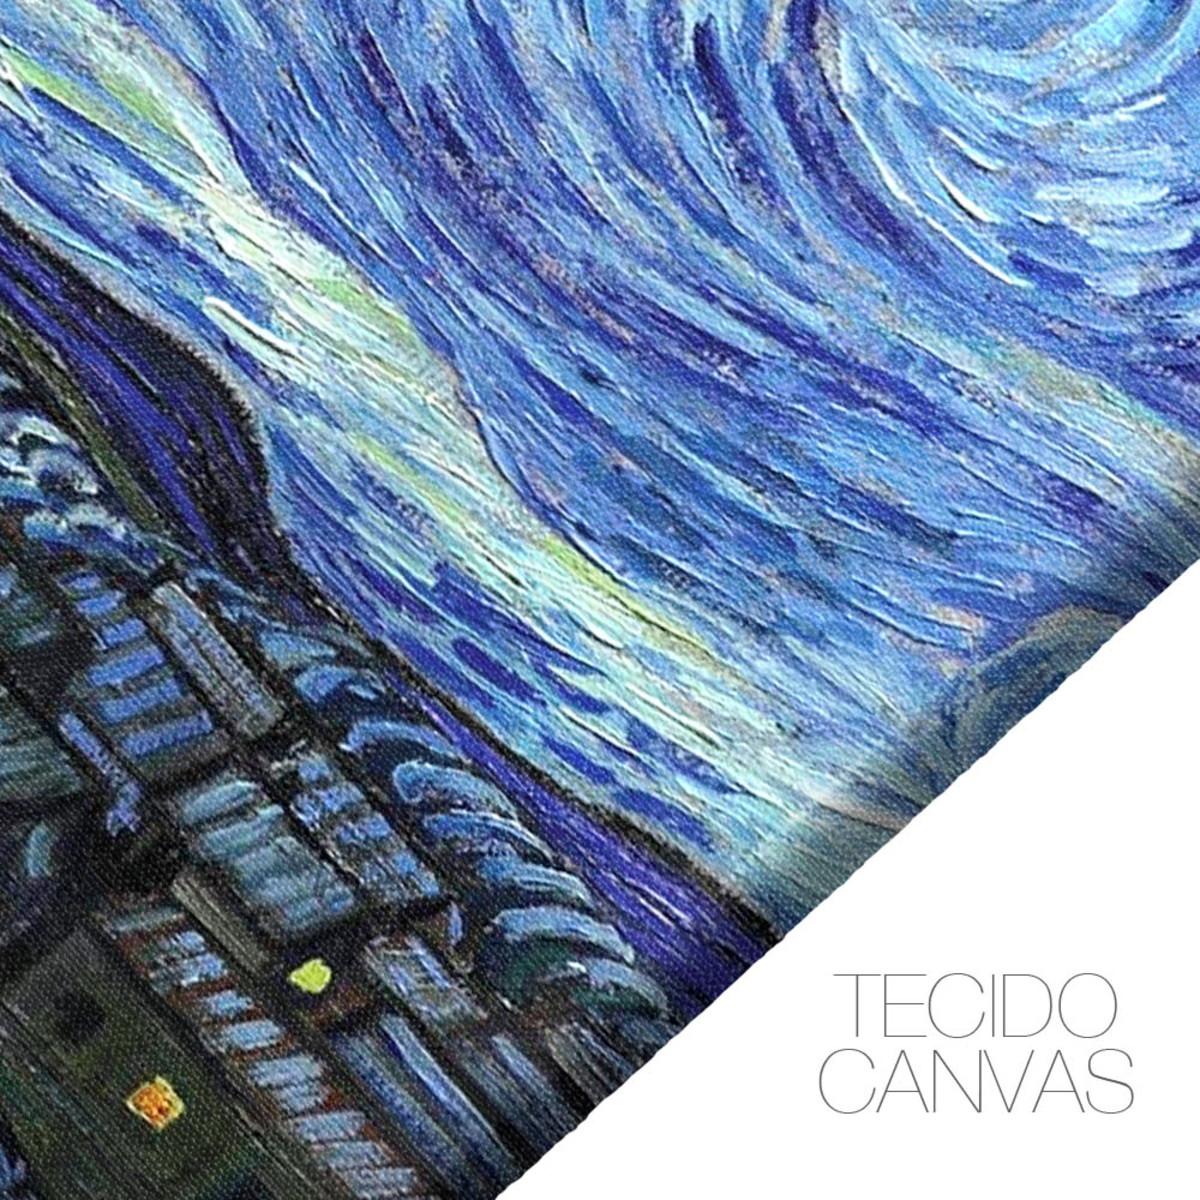 Quadro Decorativo Para Sala 120x60 Van Gogh Noite Estrelada No